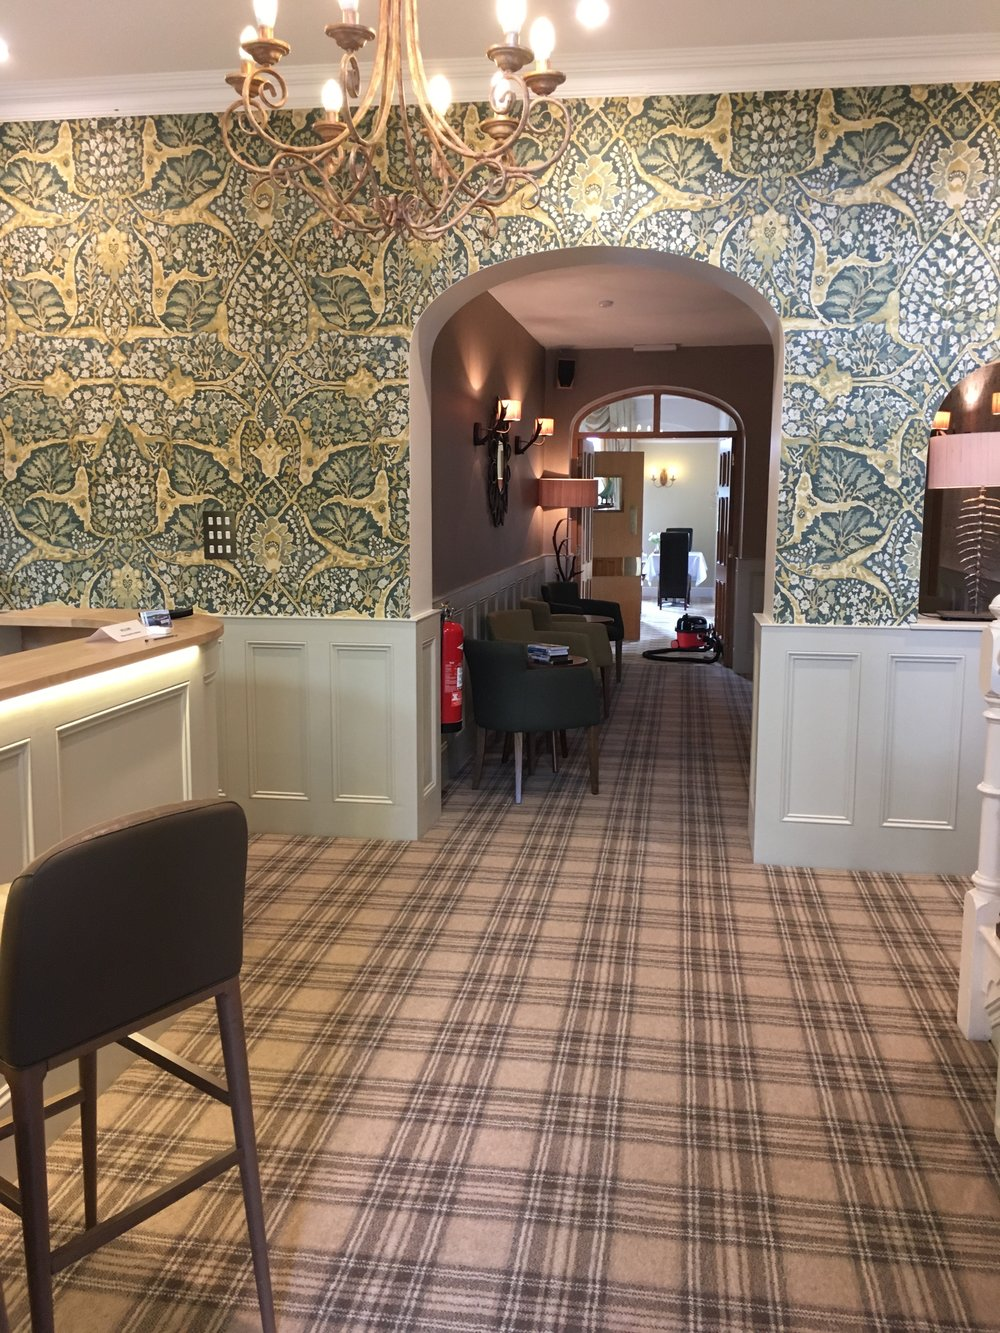 Lake House - Hotel Interior Design - Ambleside, Cumbria